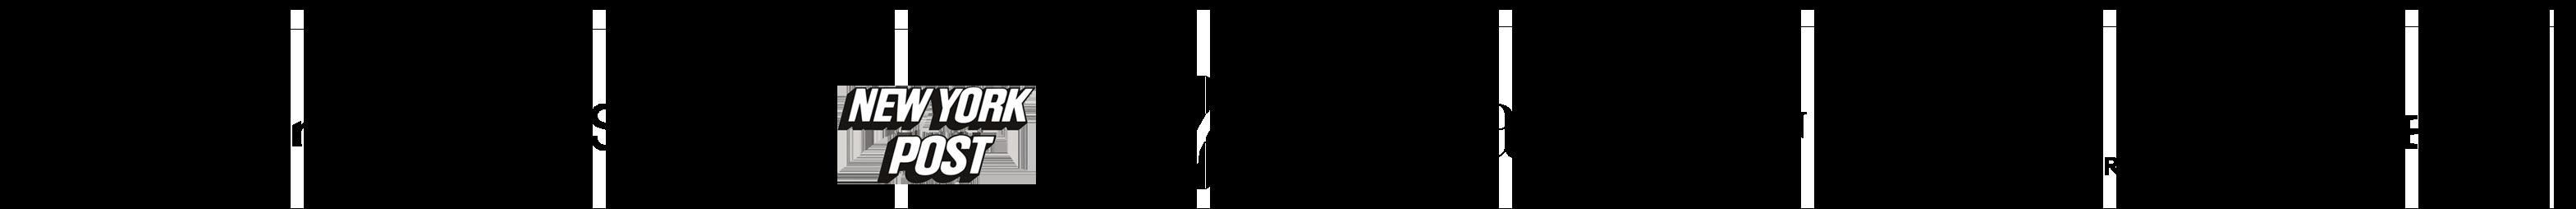 Jasmine Diaz Media Logos